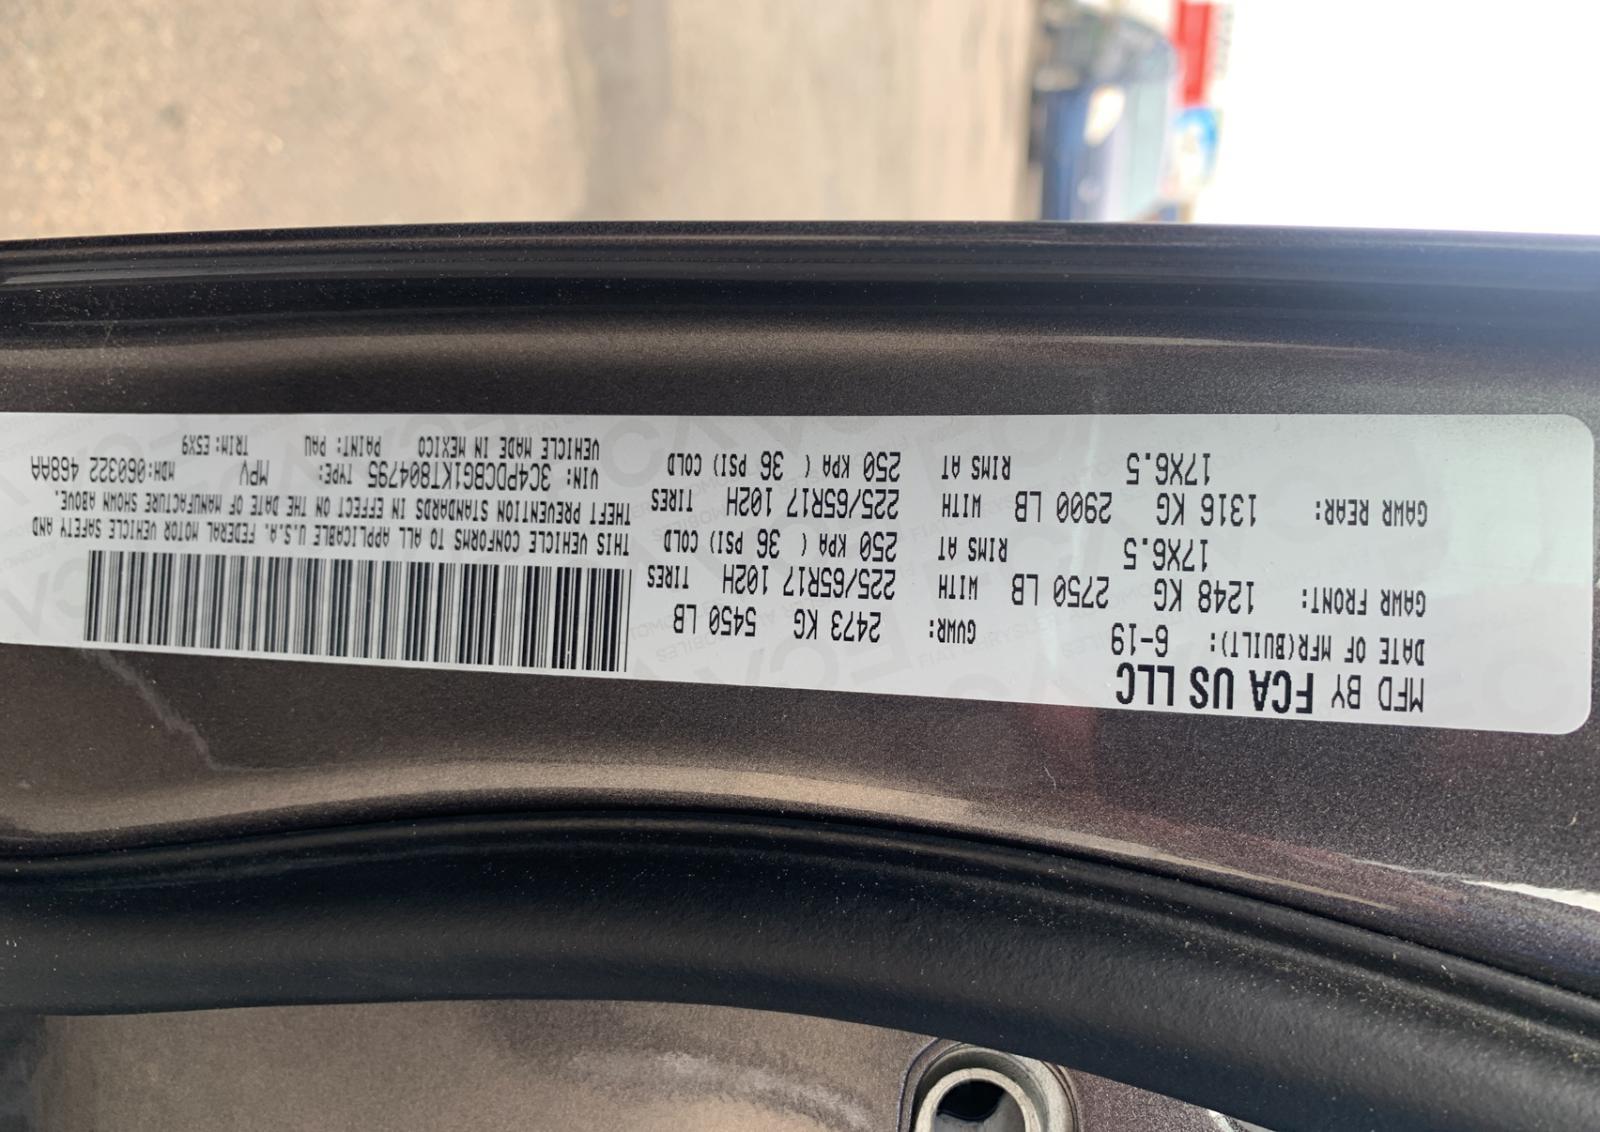 3C4PDCBG1KT804795 - 2019 Dodge Journey Se 3.6L